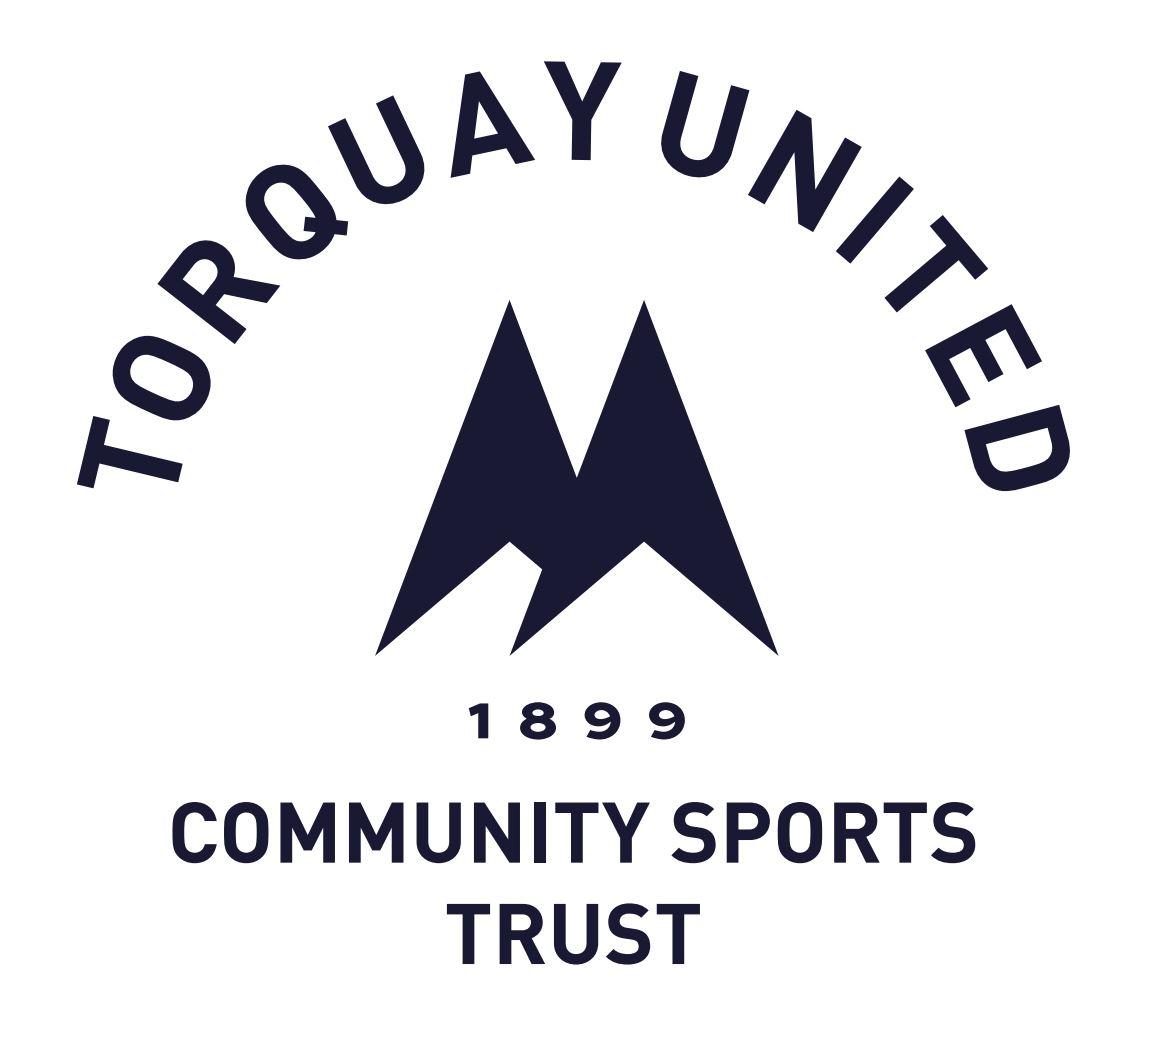 Torquay United Community Sports Trust